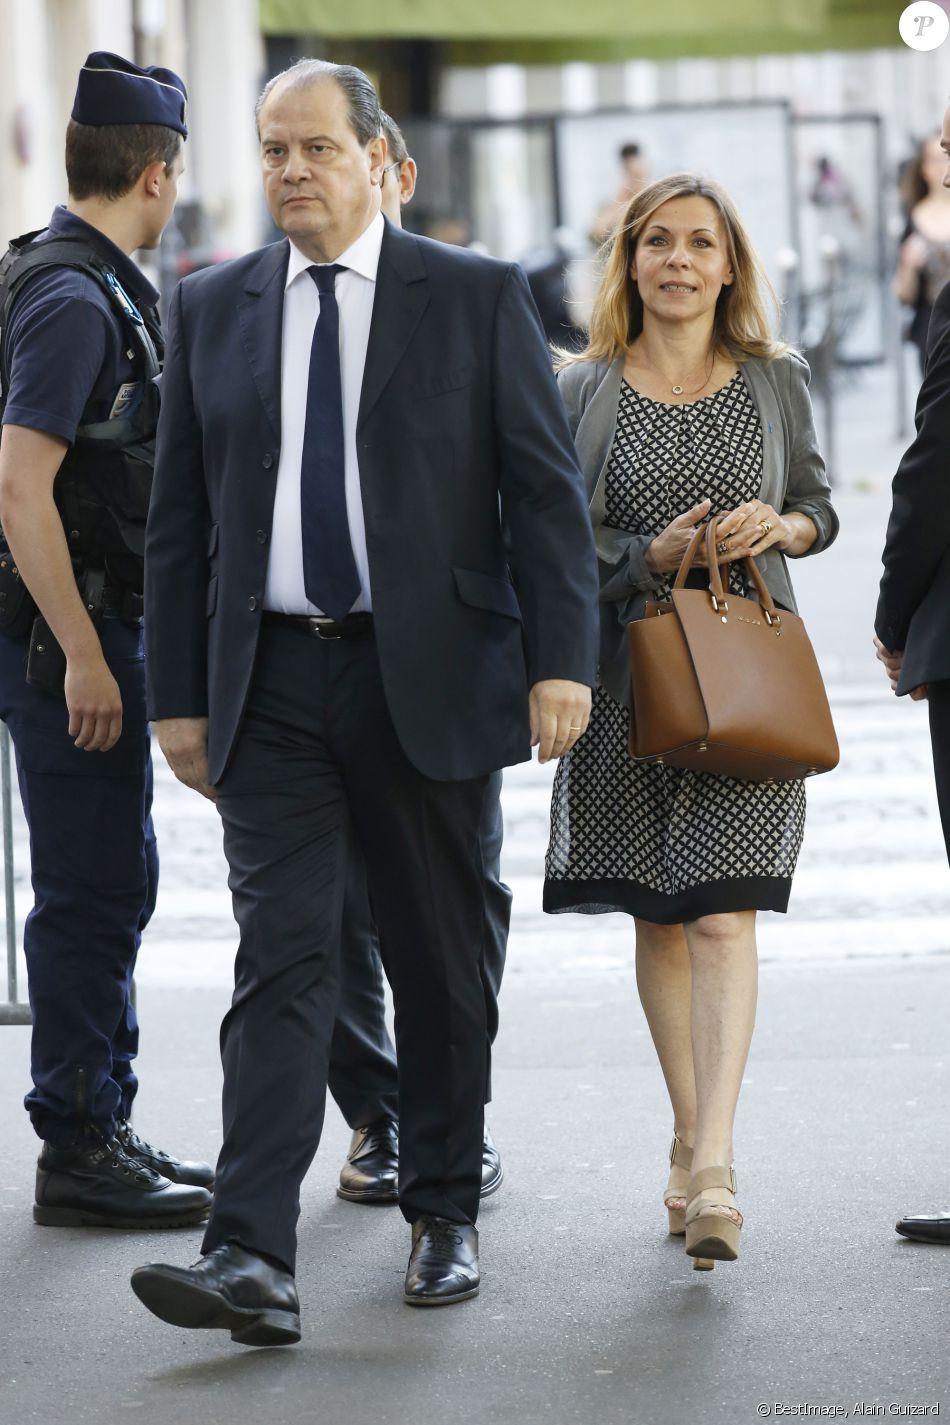 Jean christophe cambadelis et sa femme site de v tements en jean la mode - Jean francois balmer et sa femme ...